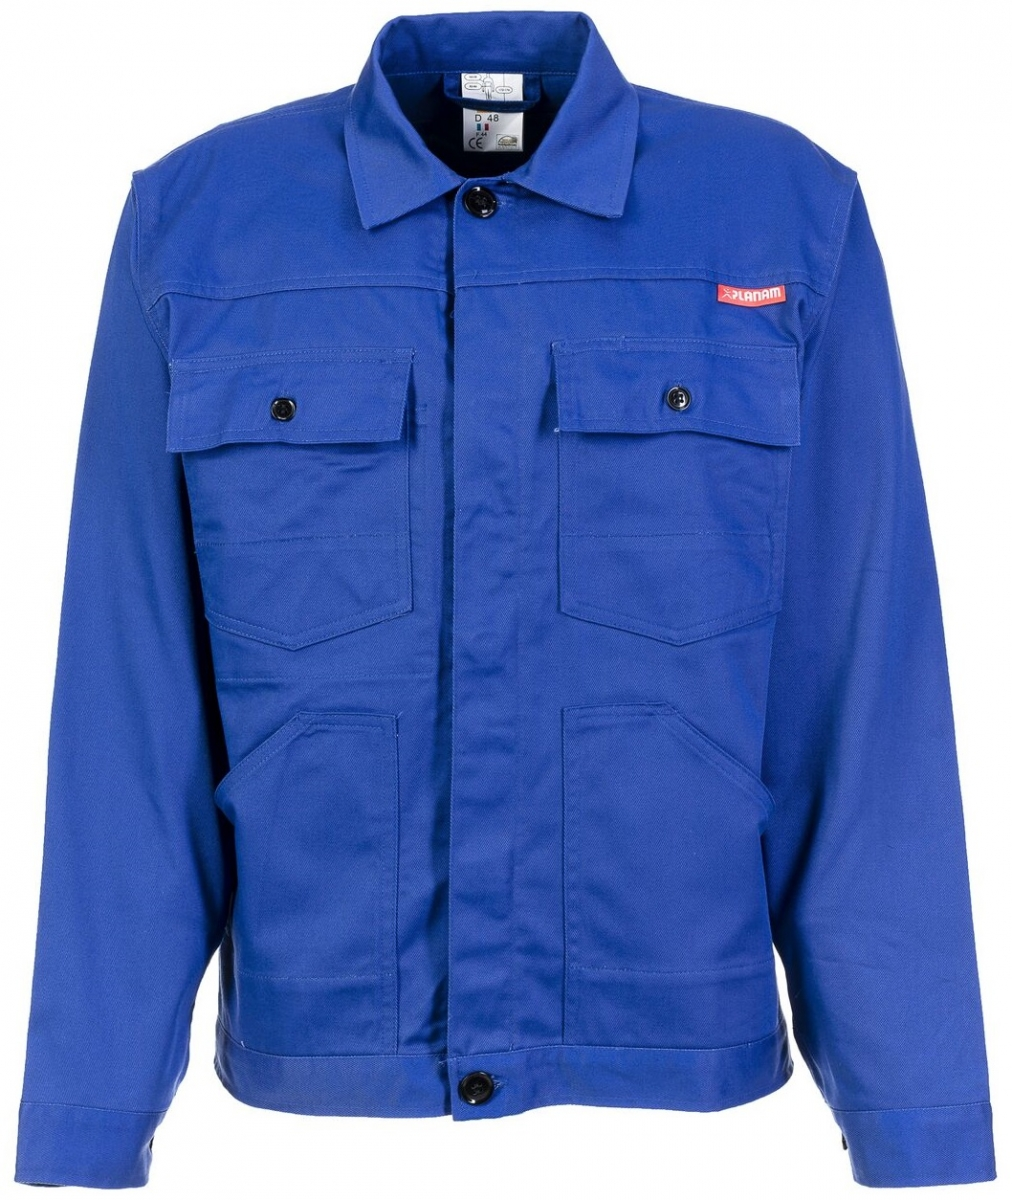 PLANAM Bundjacke, Arbeits-Berufs-Jacke, MG 290, kornblau